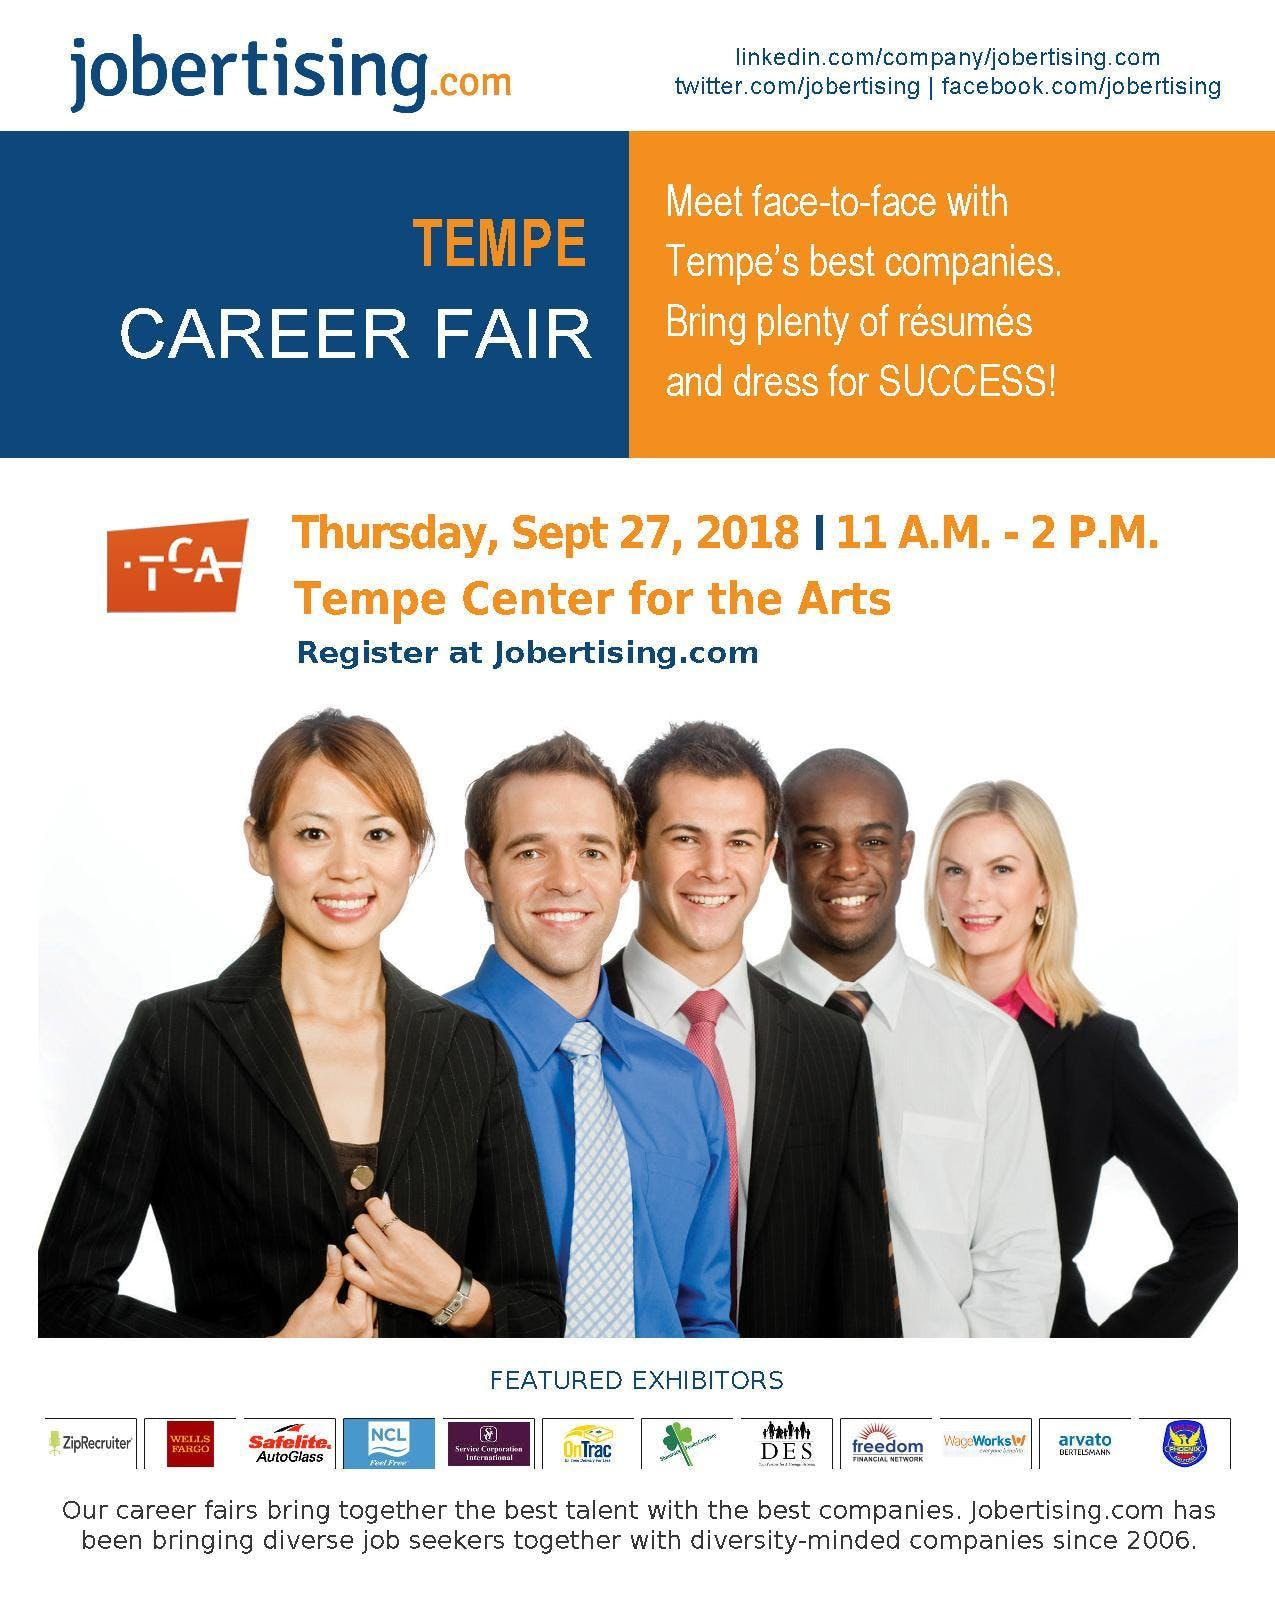 Tempe Career Fair